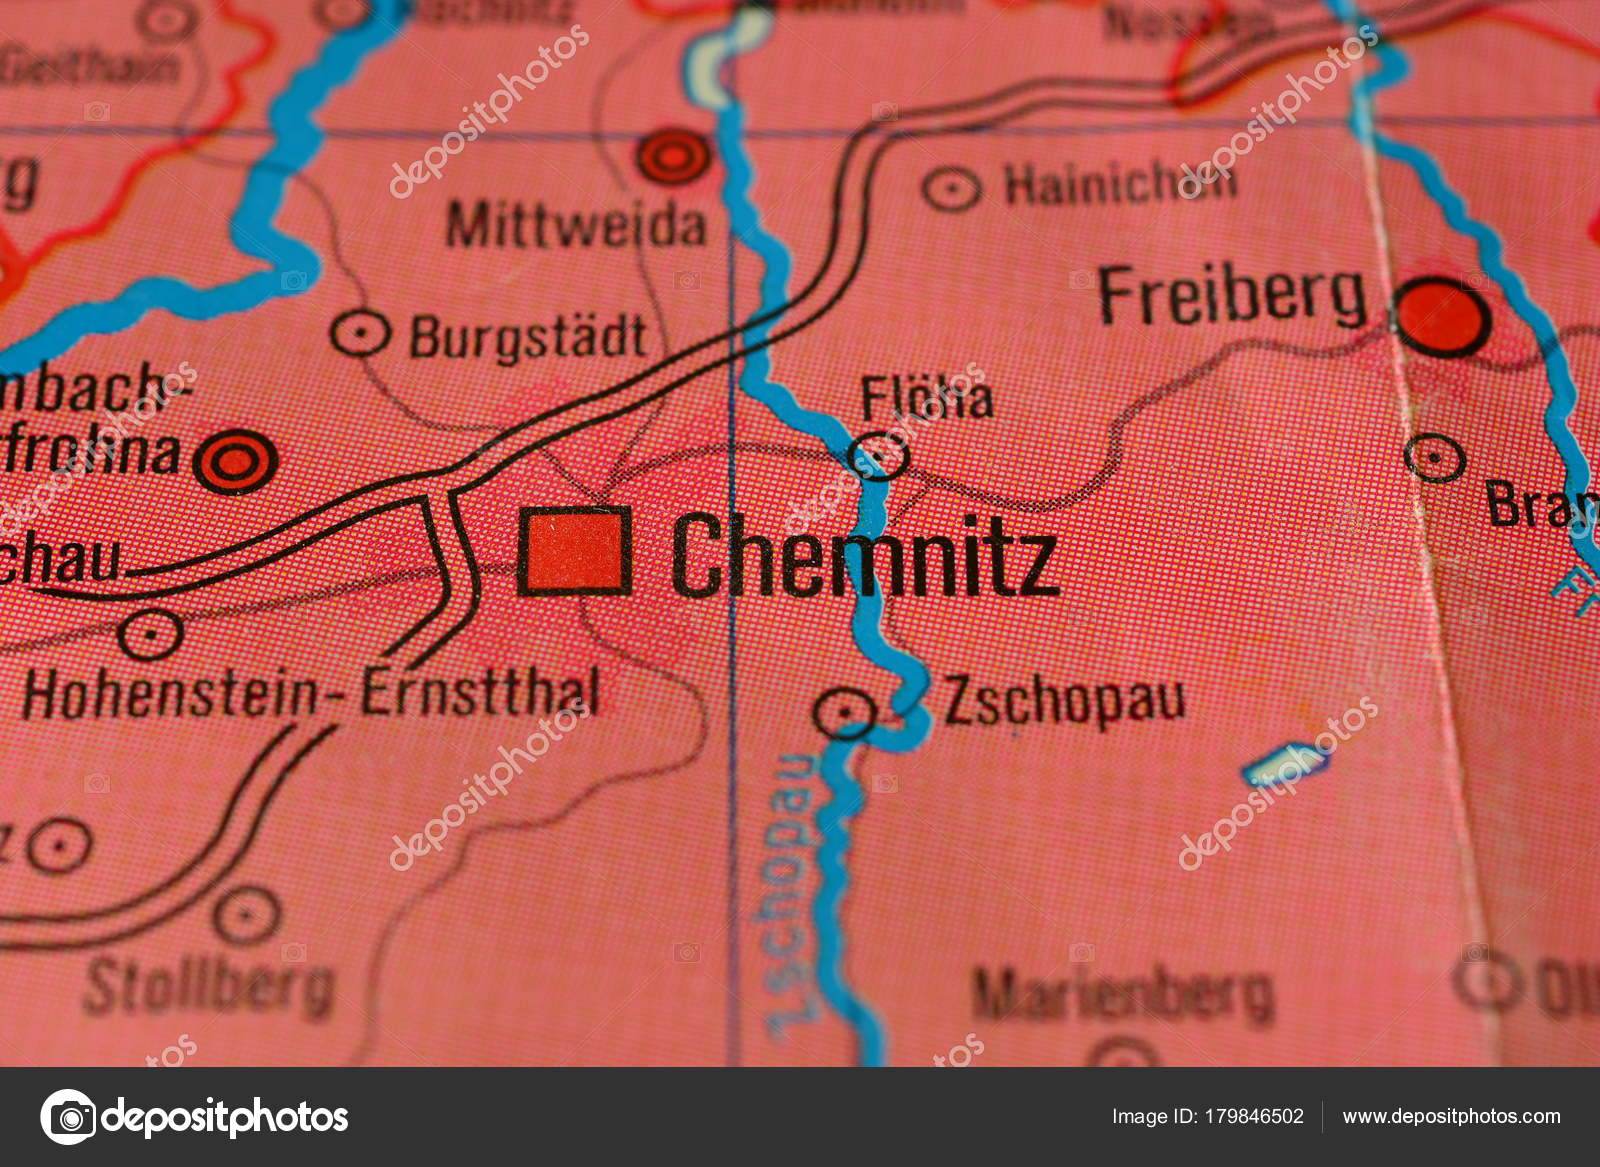 Karte Chemnitz.Stadt Name Chemnitz Auf Der Karte Stockfoto C Photographer